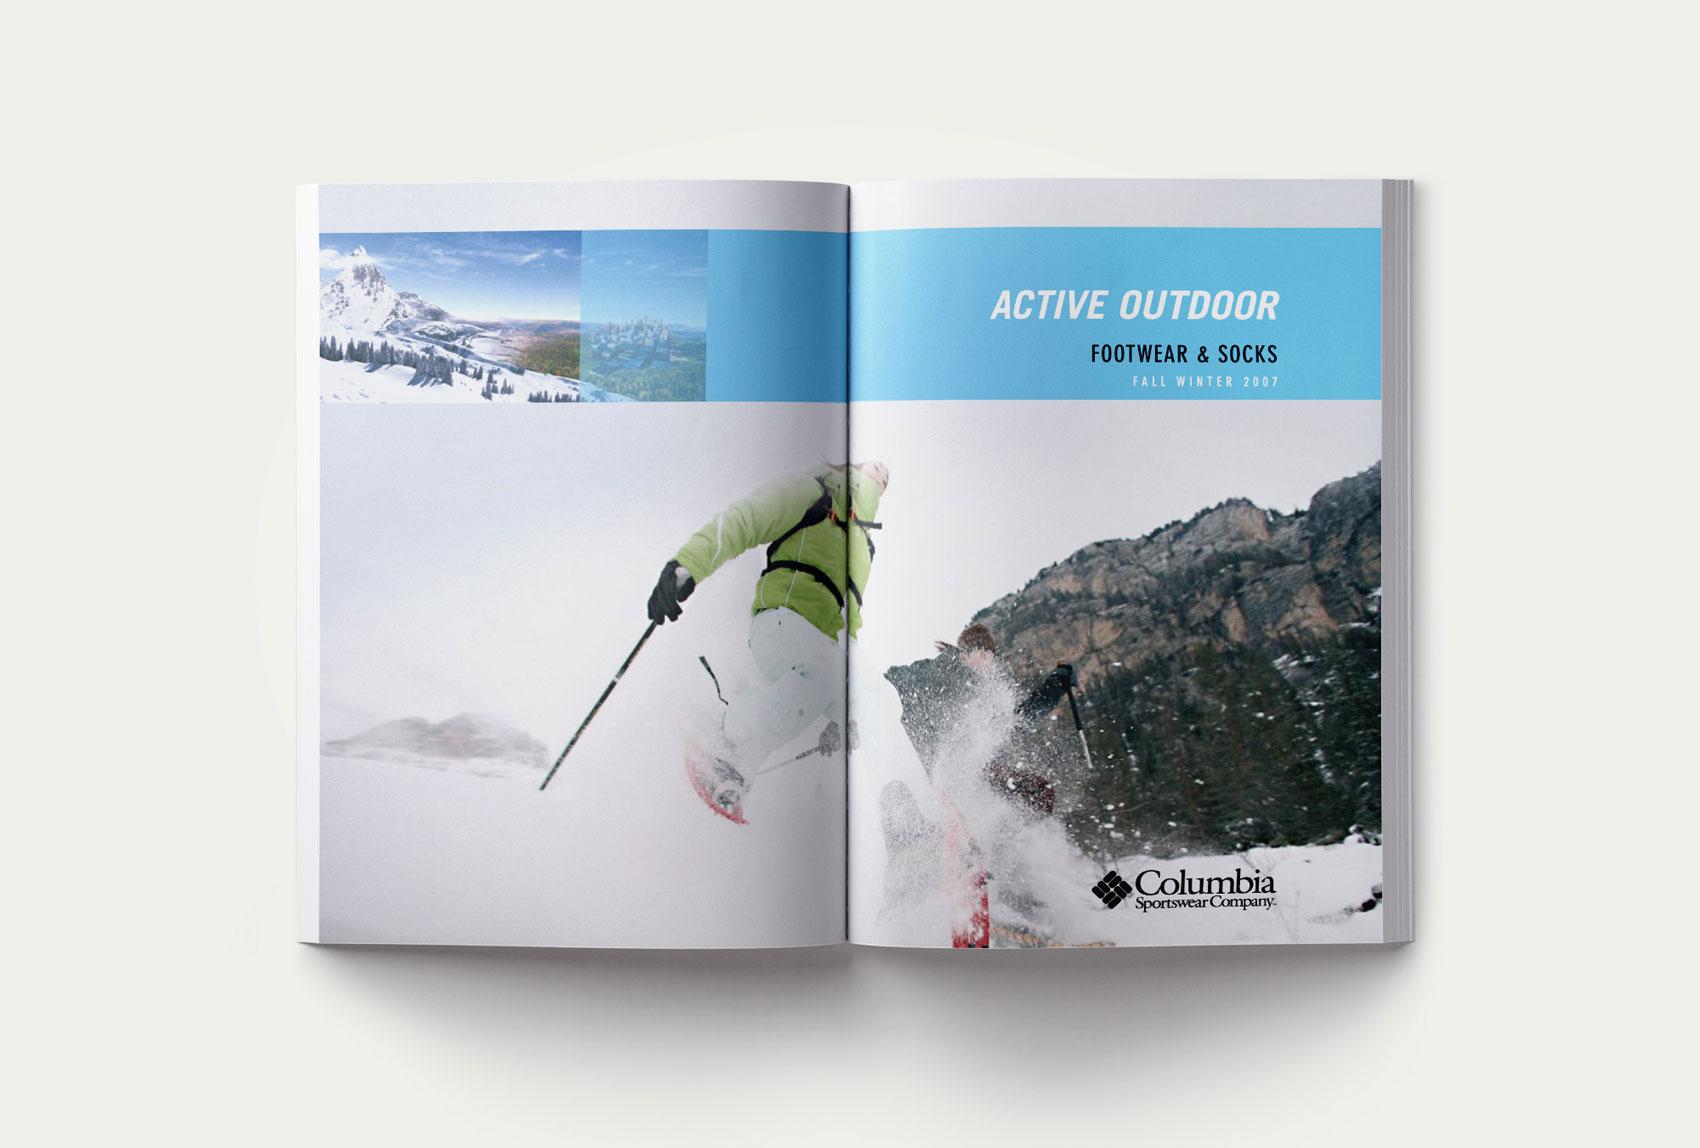 catalogue-columbia-automne-hiver-1